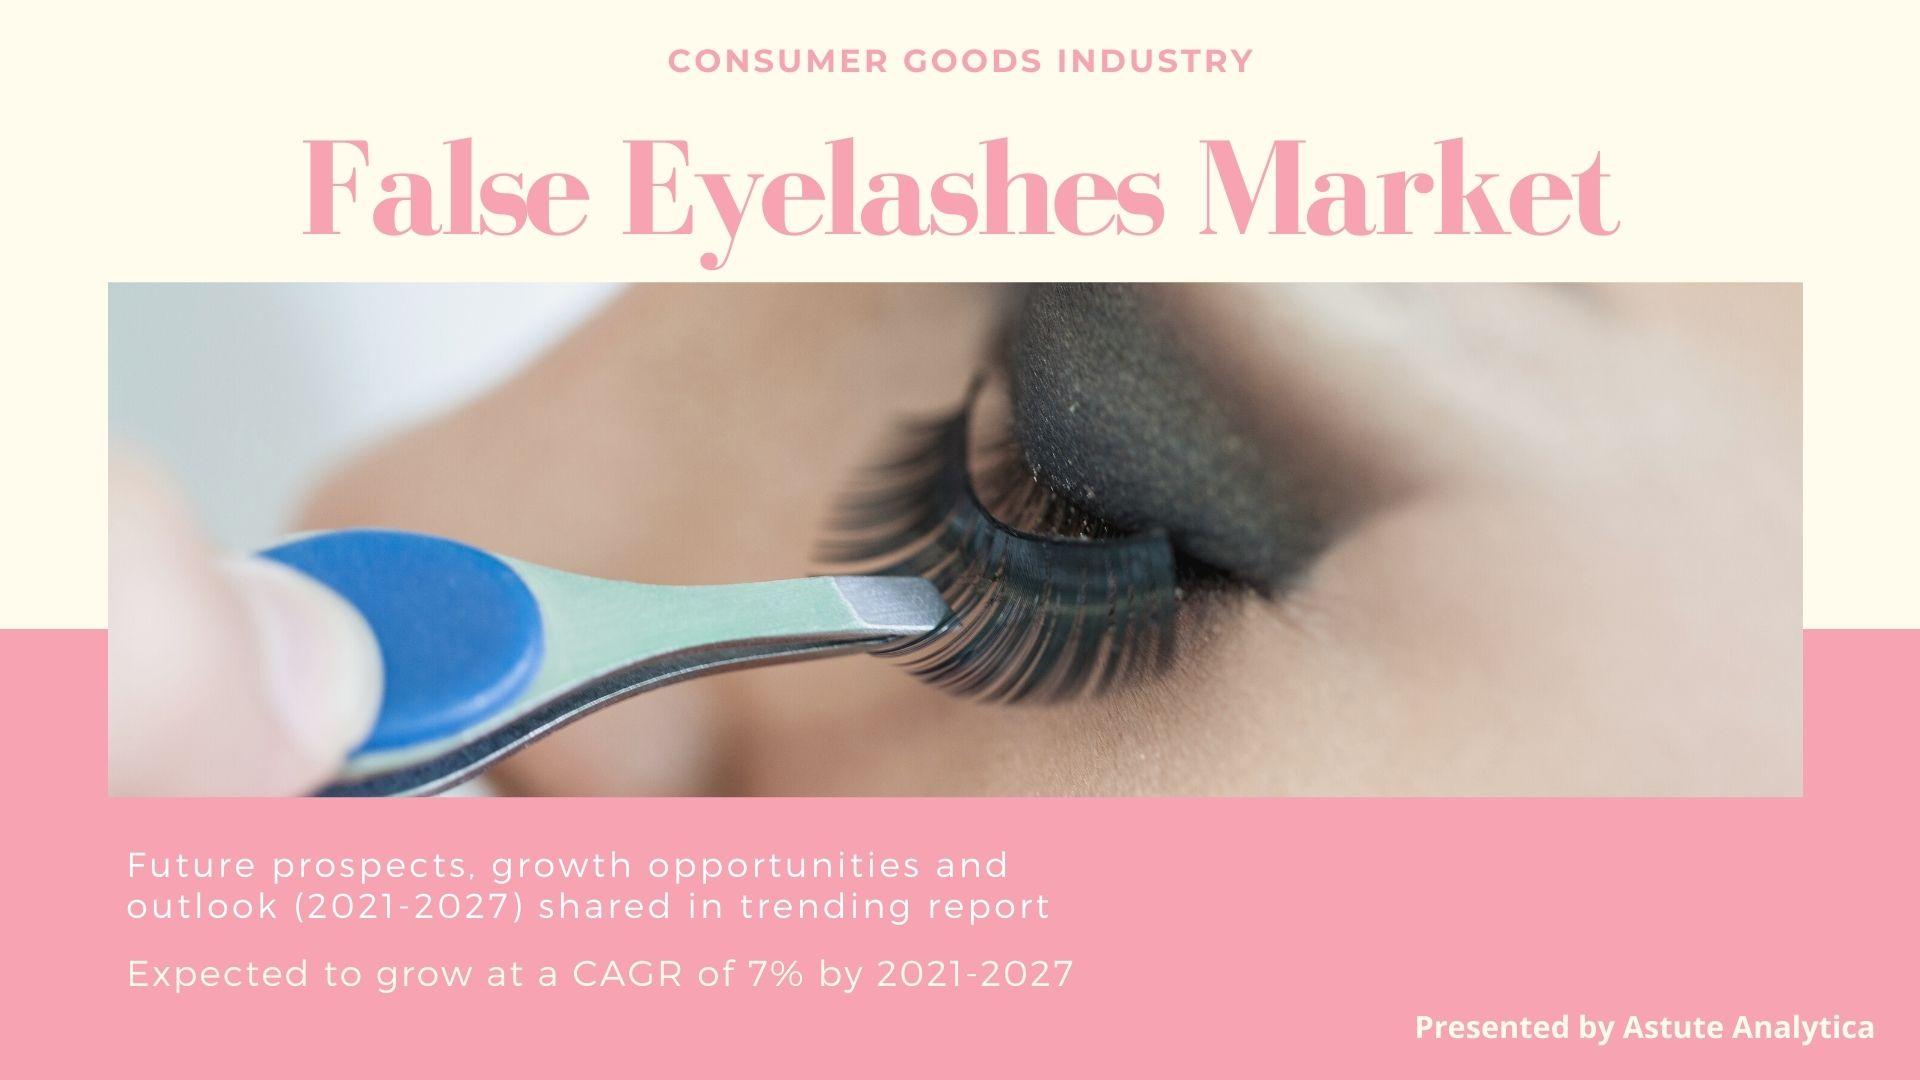 False Eyelashes Market to Witness Strong Growth Over 2021-2027